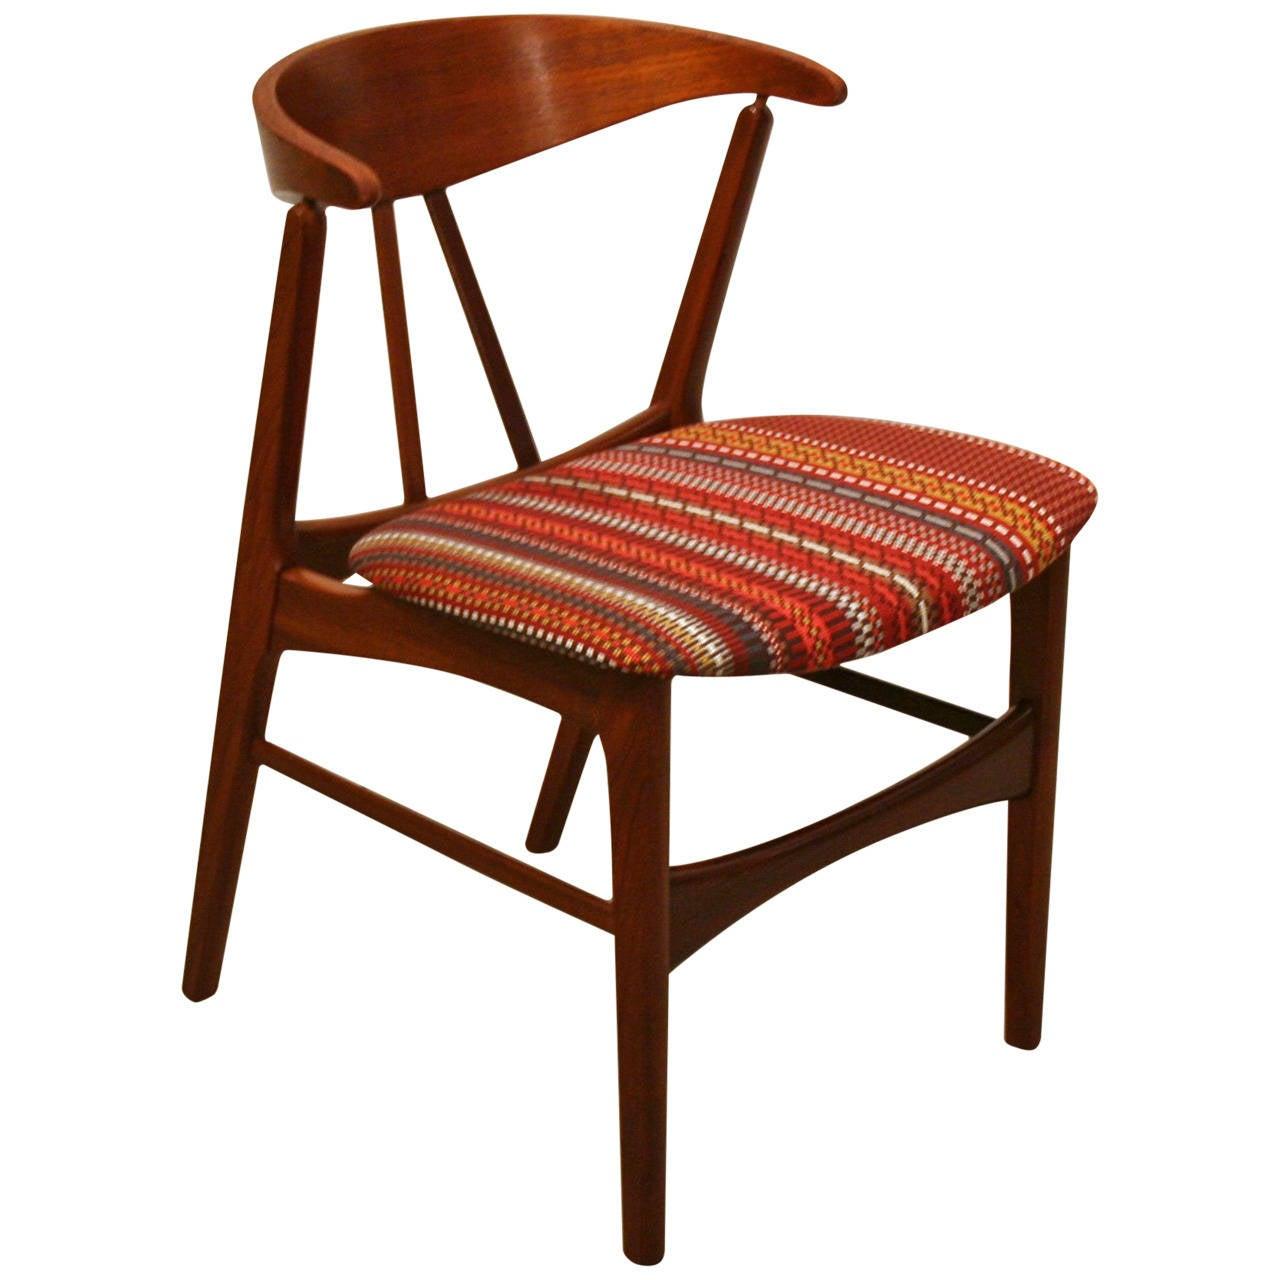 Vintage Teak Accent Chair at 1stdibs